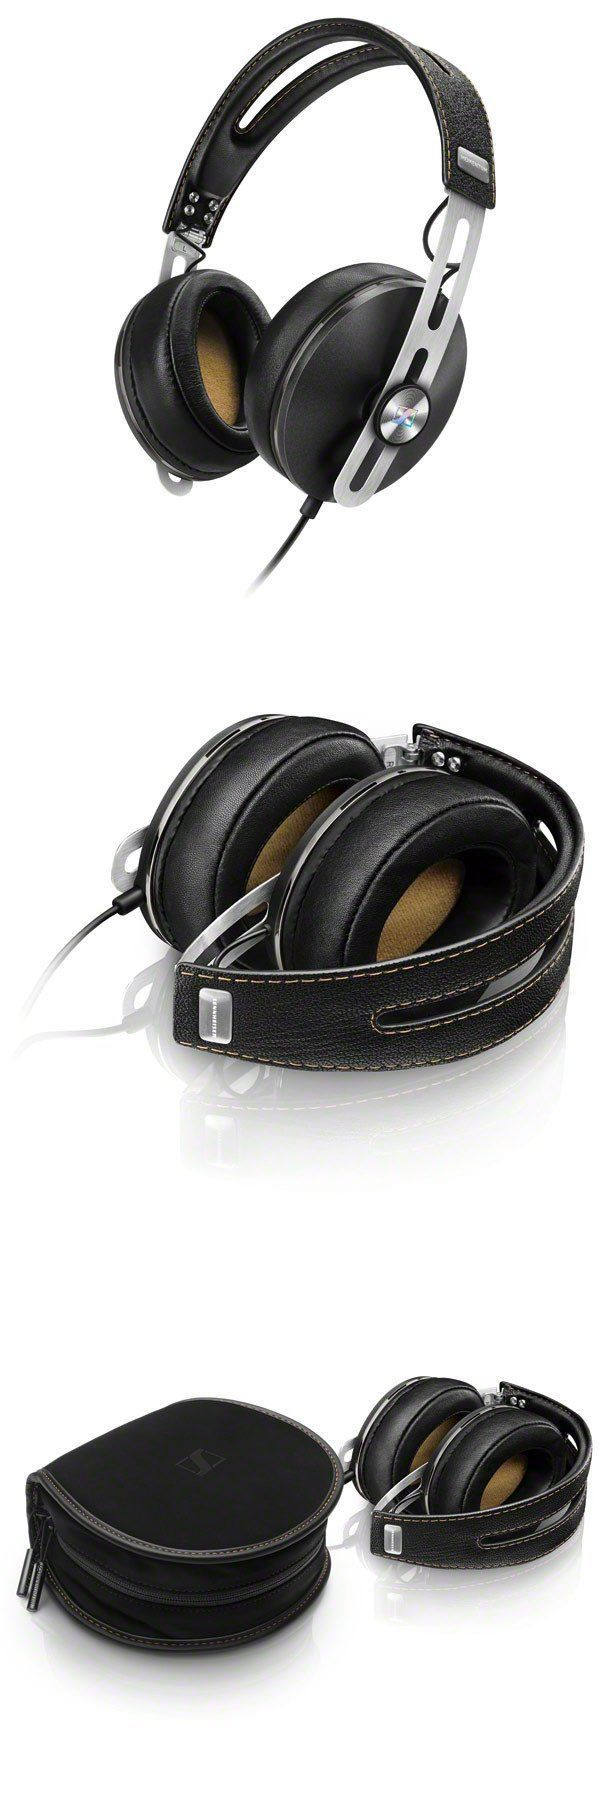 Headphones: Sennheiser M2aei Momentum 2.0 Foldable Over-Ear Stereo Audio Headphones Black BUY IT NOW ONLY: $179.5